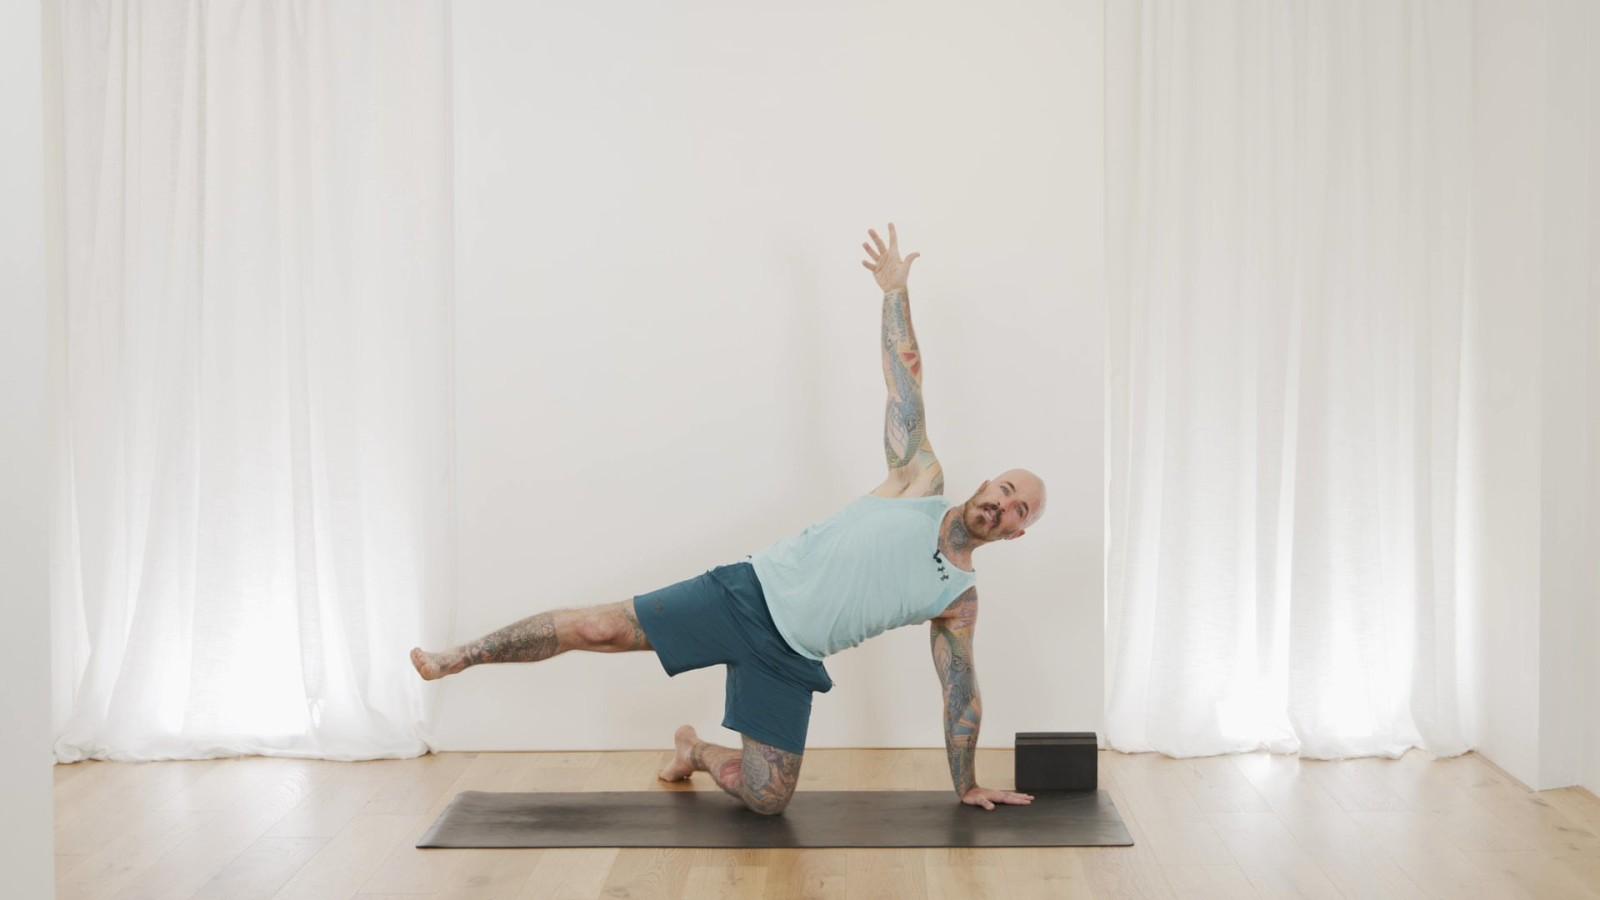 Yoga Foundations - Restoring Balance with Ari Levanael